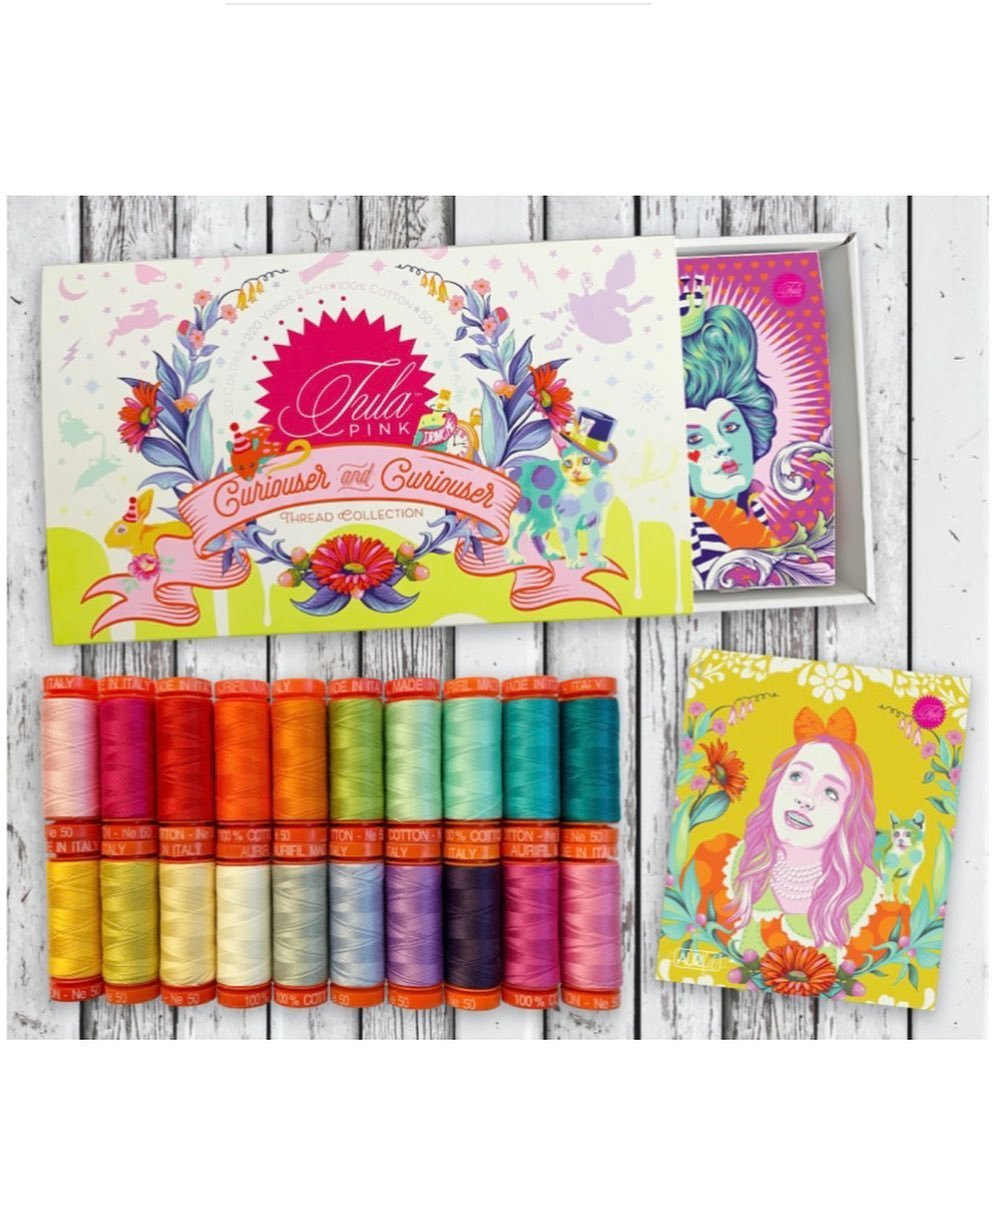 Coming! Tula Pink Curiouser & Curiouser Collection Pre-Order Button